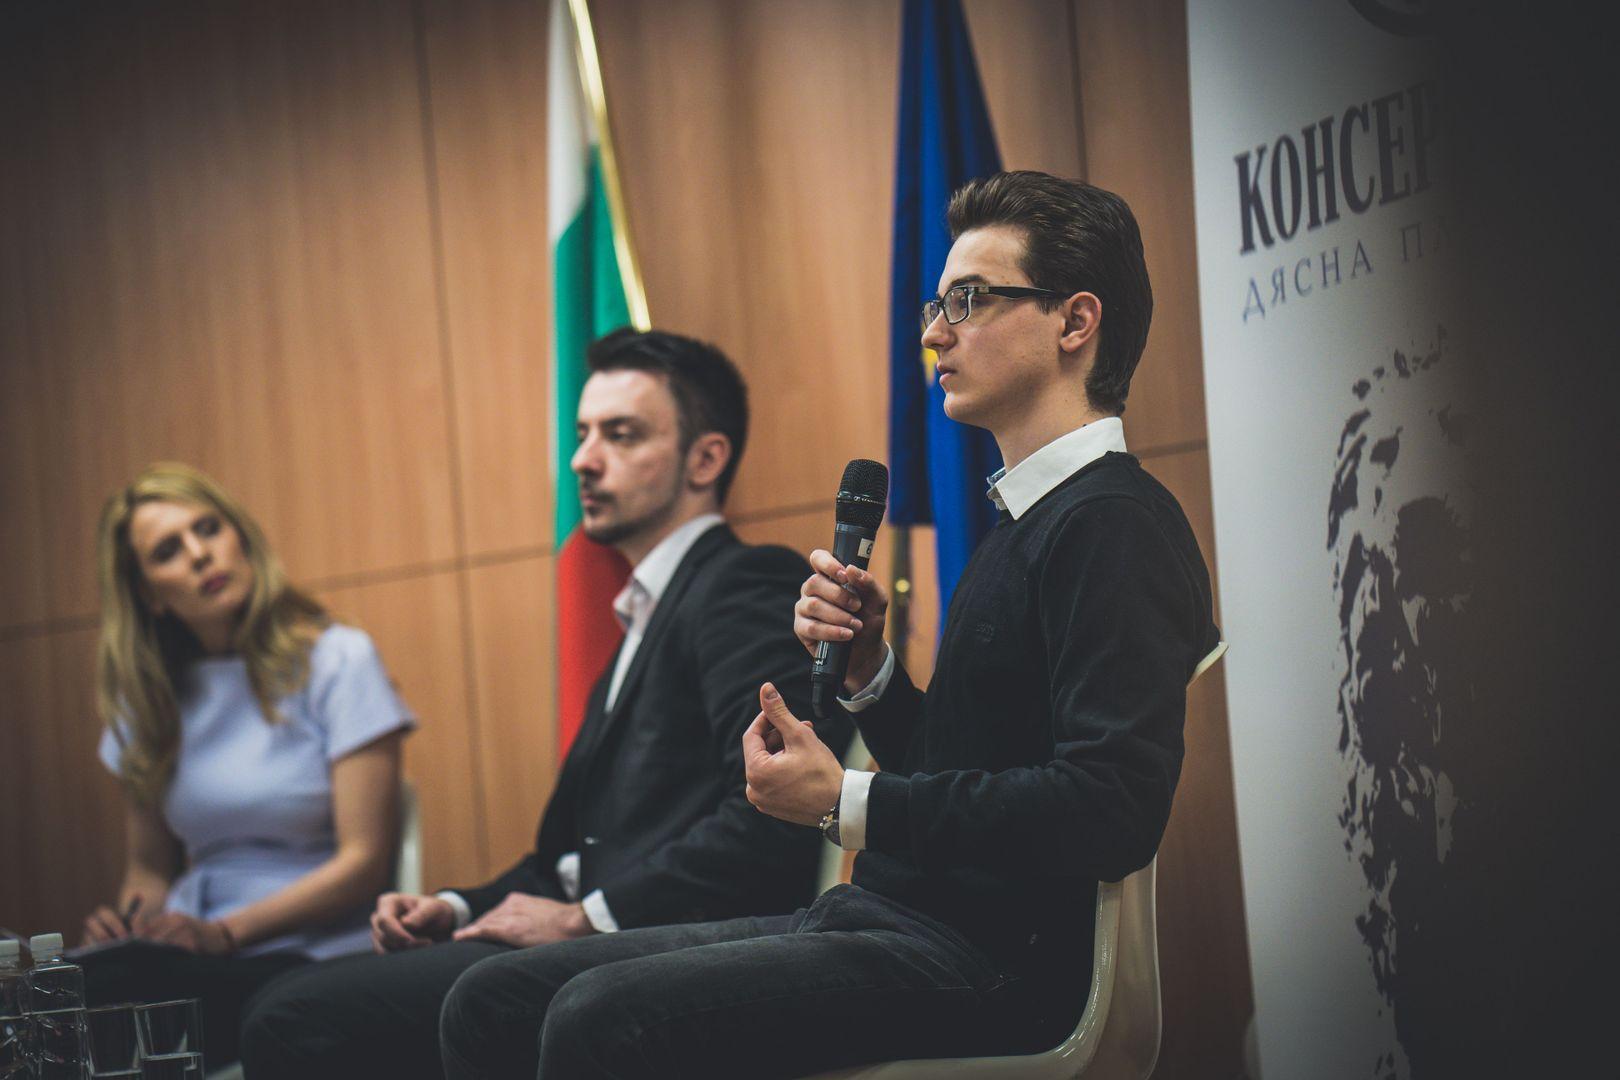 conservative-millenium-strongeurope-event-april-29